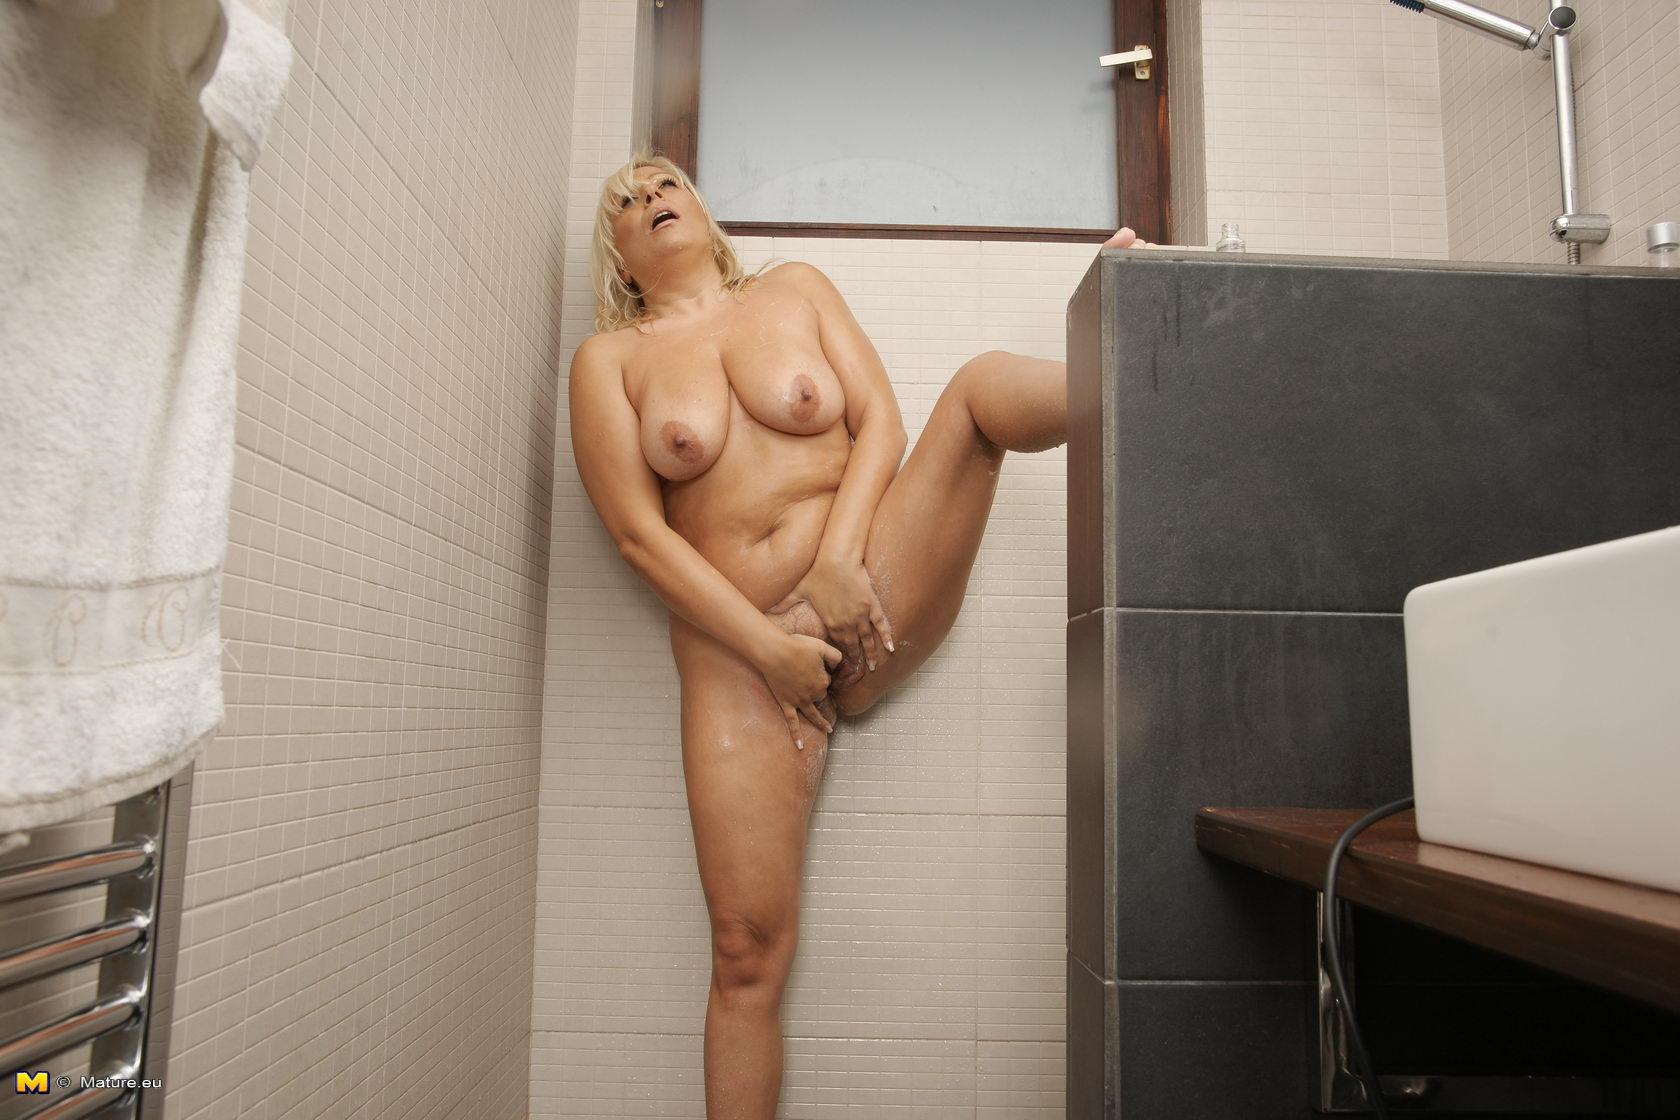 Wet cock pictures